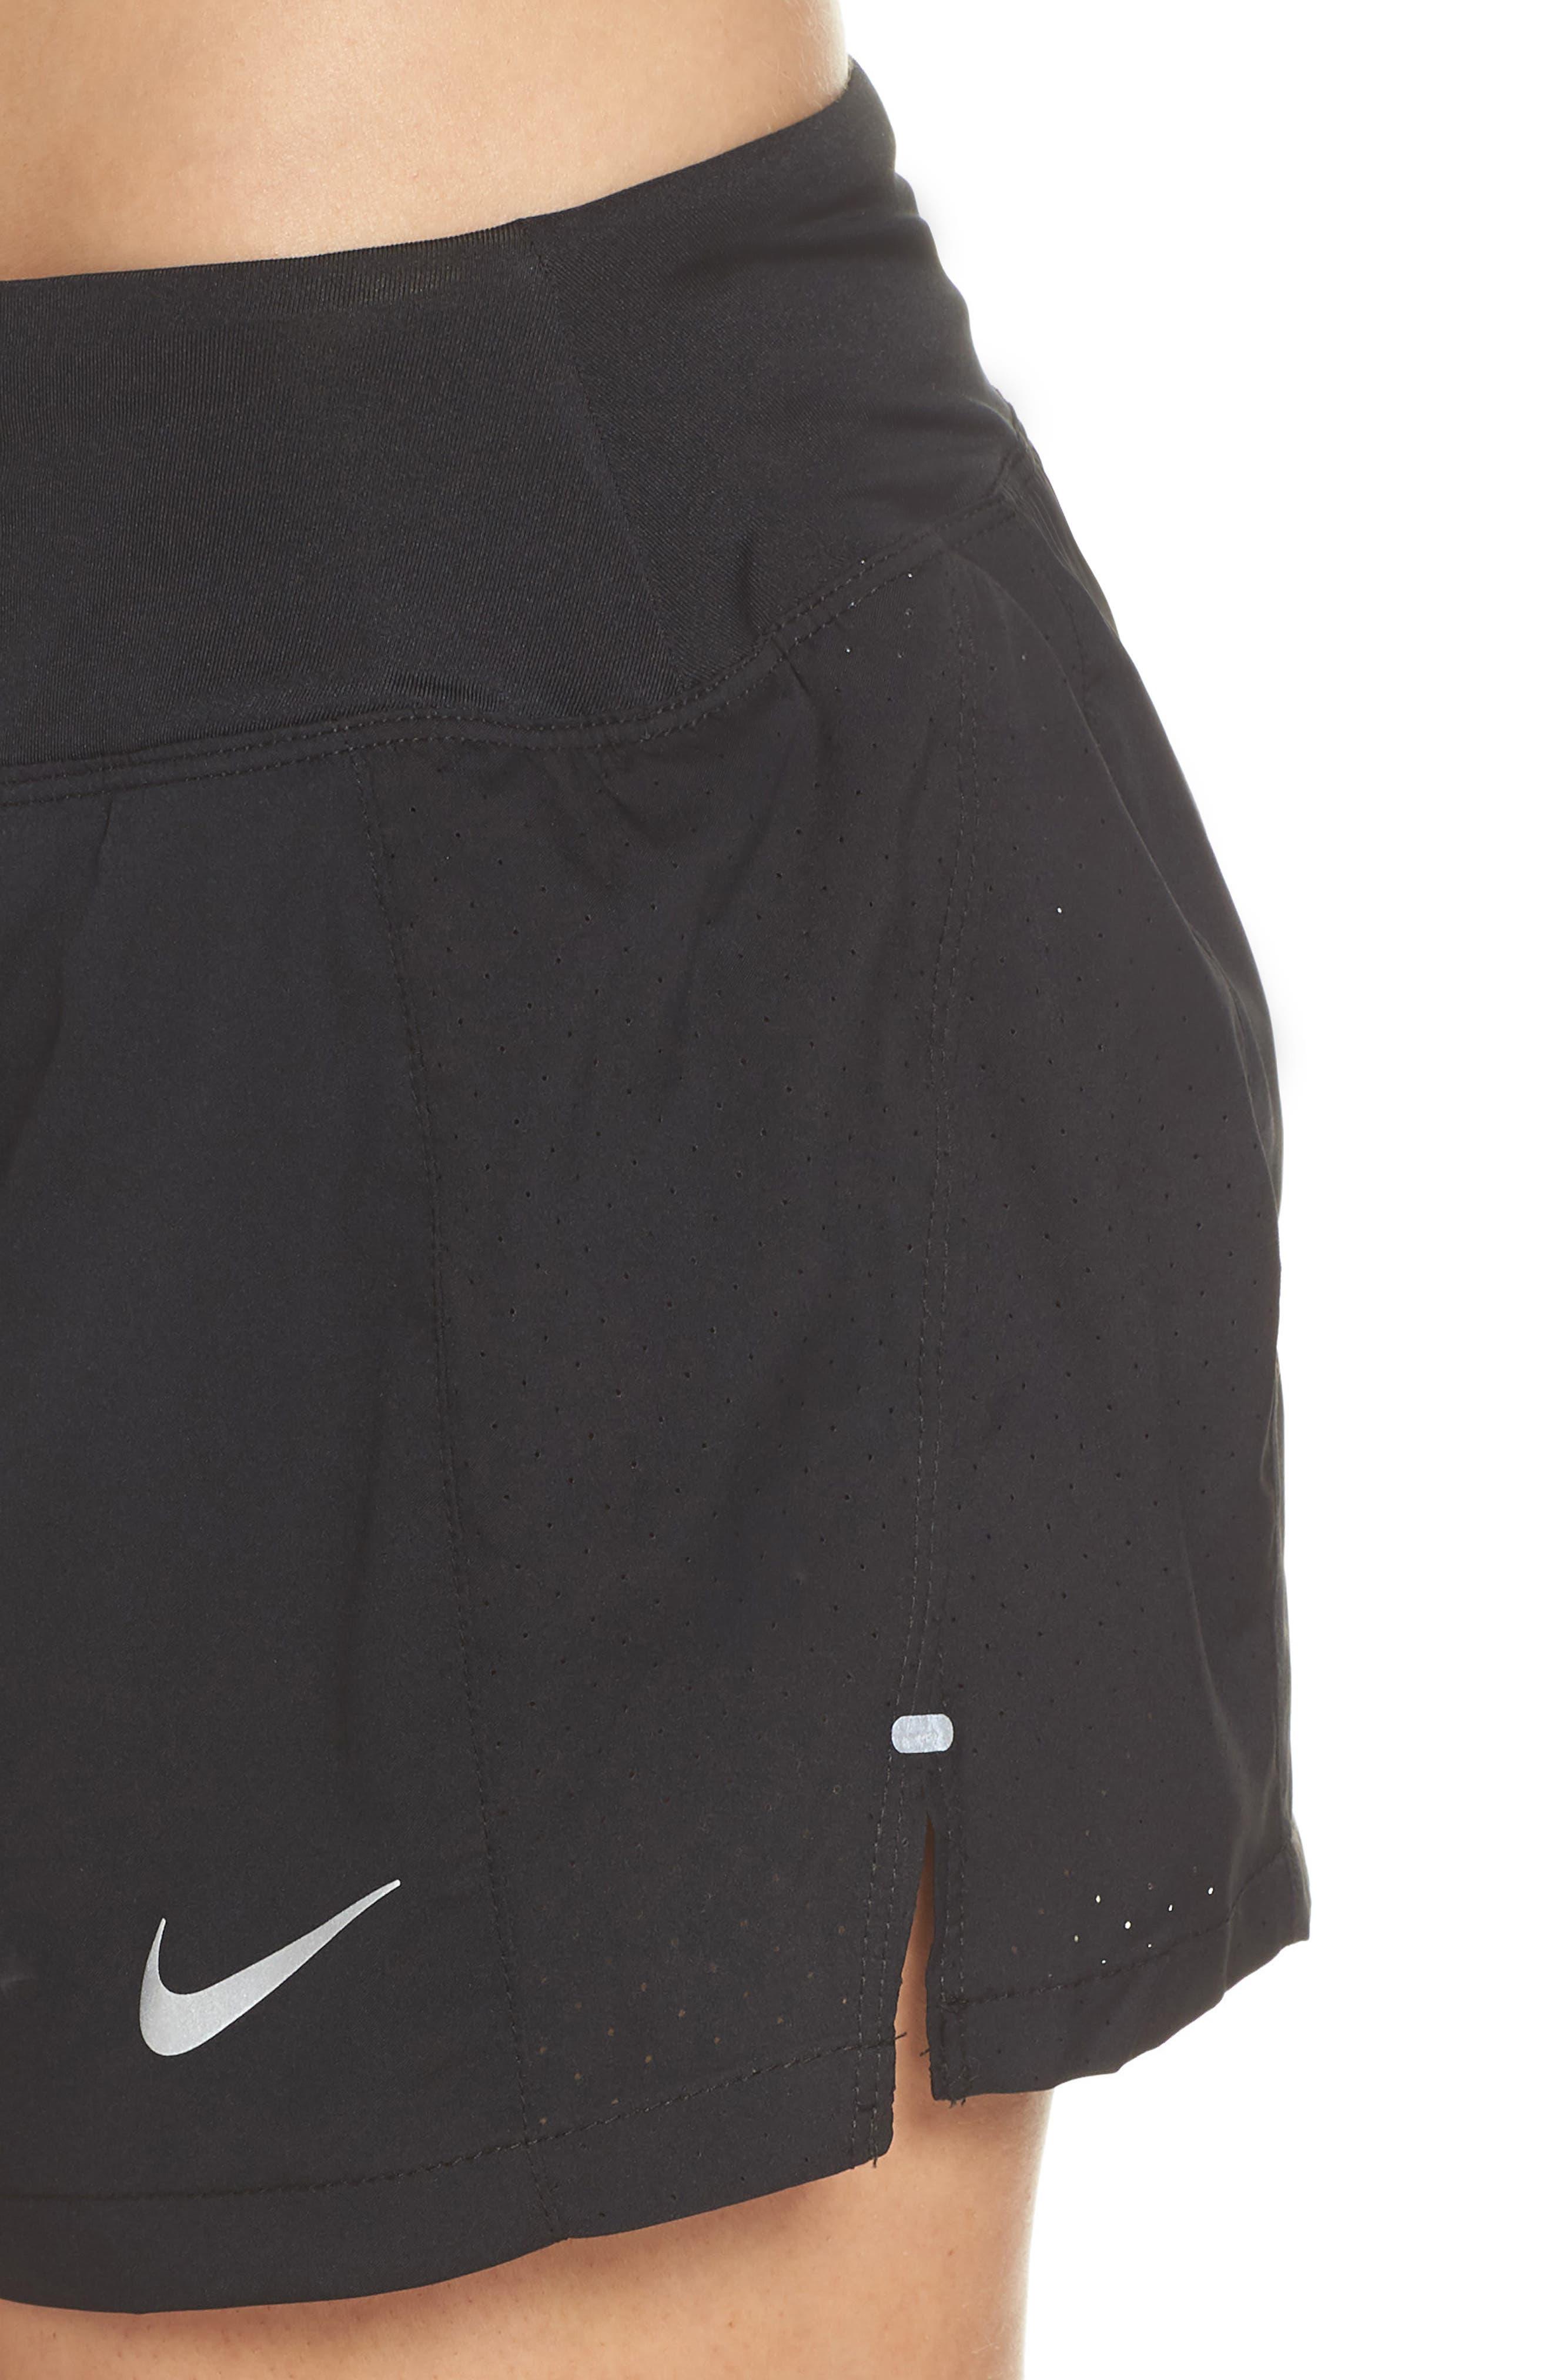 Dry Eclipse Running Shorts,                             Alternate thumbnail 4, color,                             Black